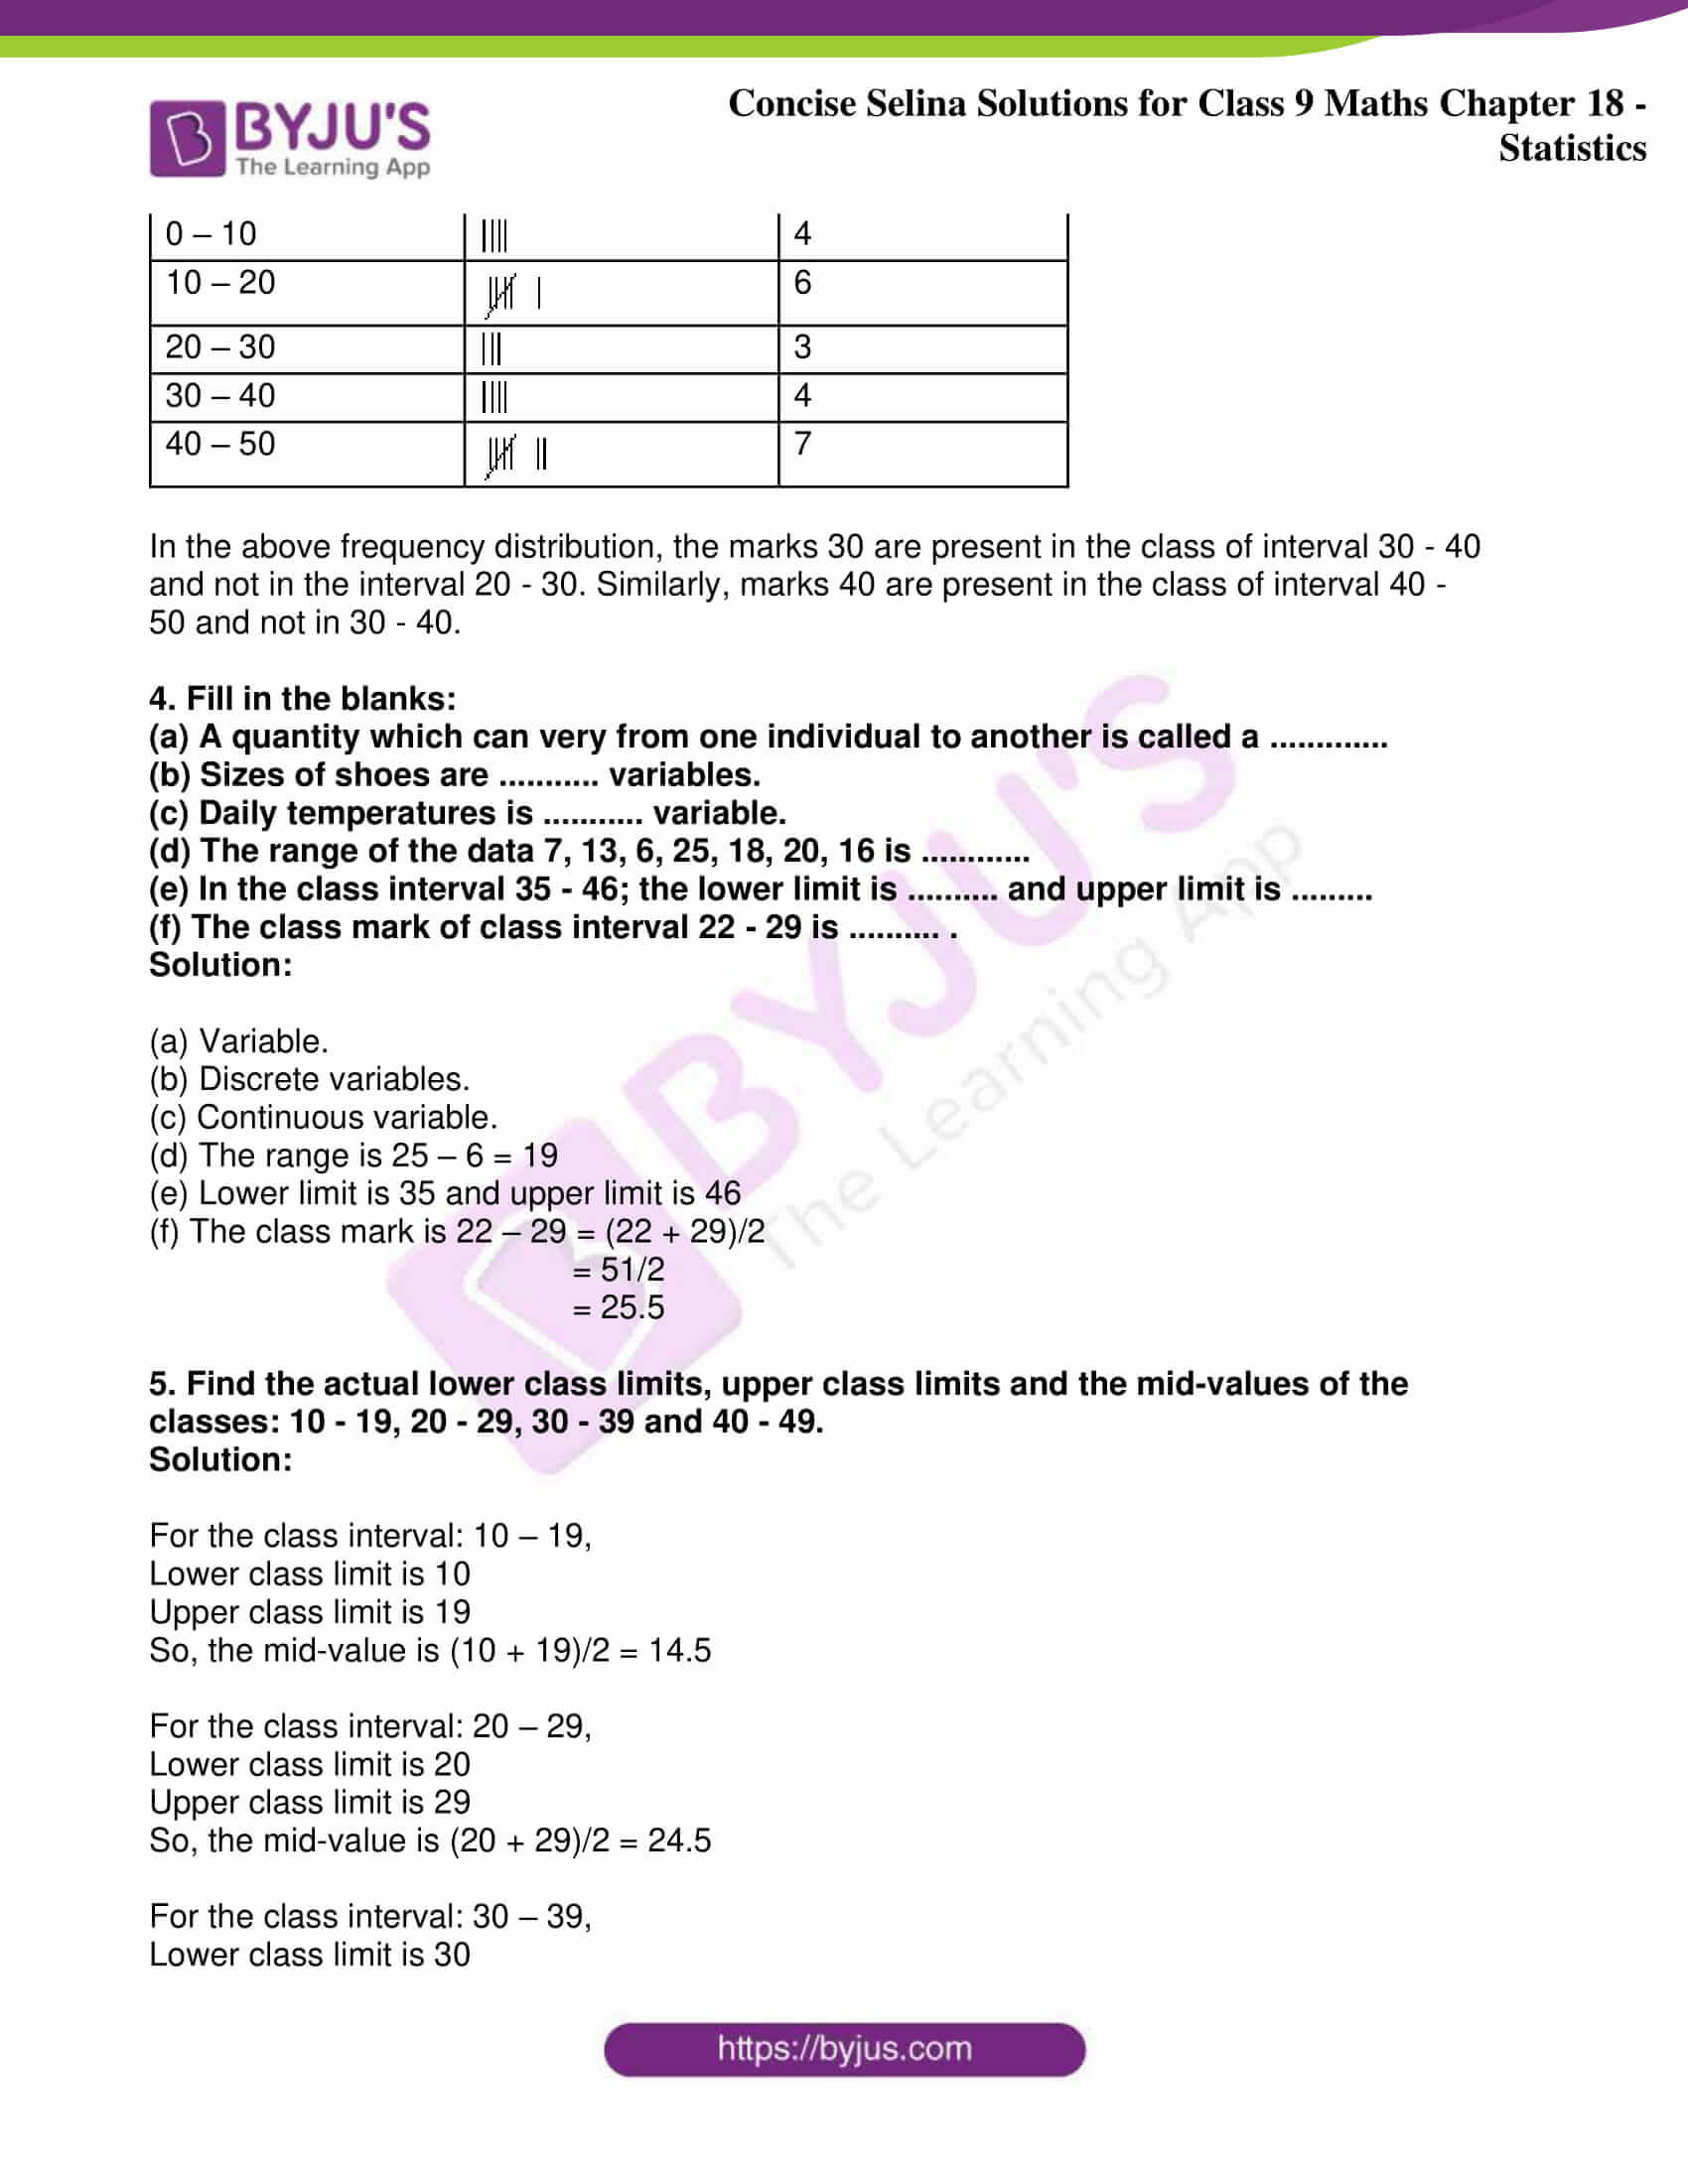 icse class 9 jun9 maths selina solutions chapter 18 statistics 02